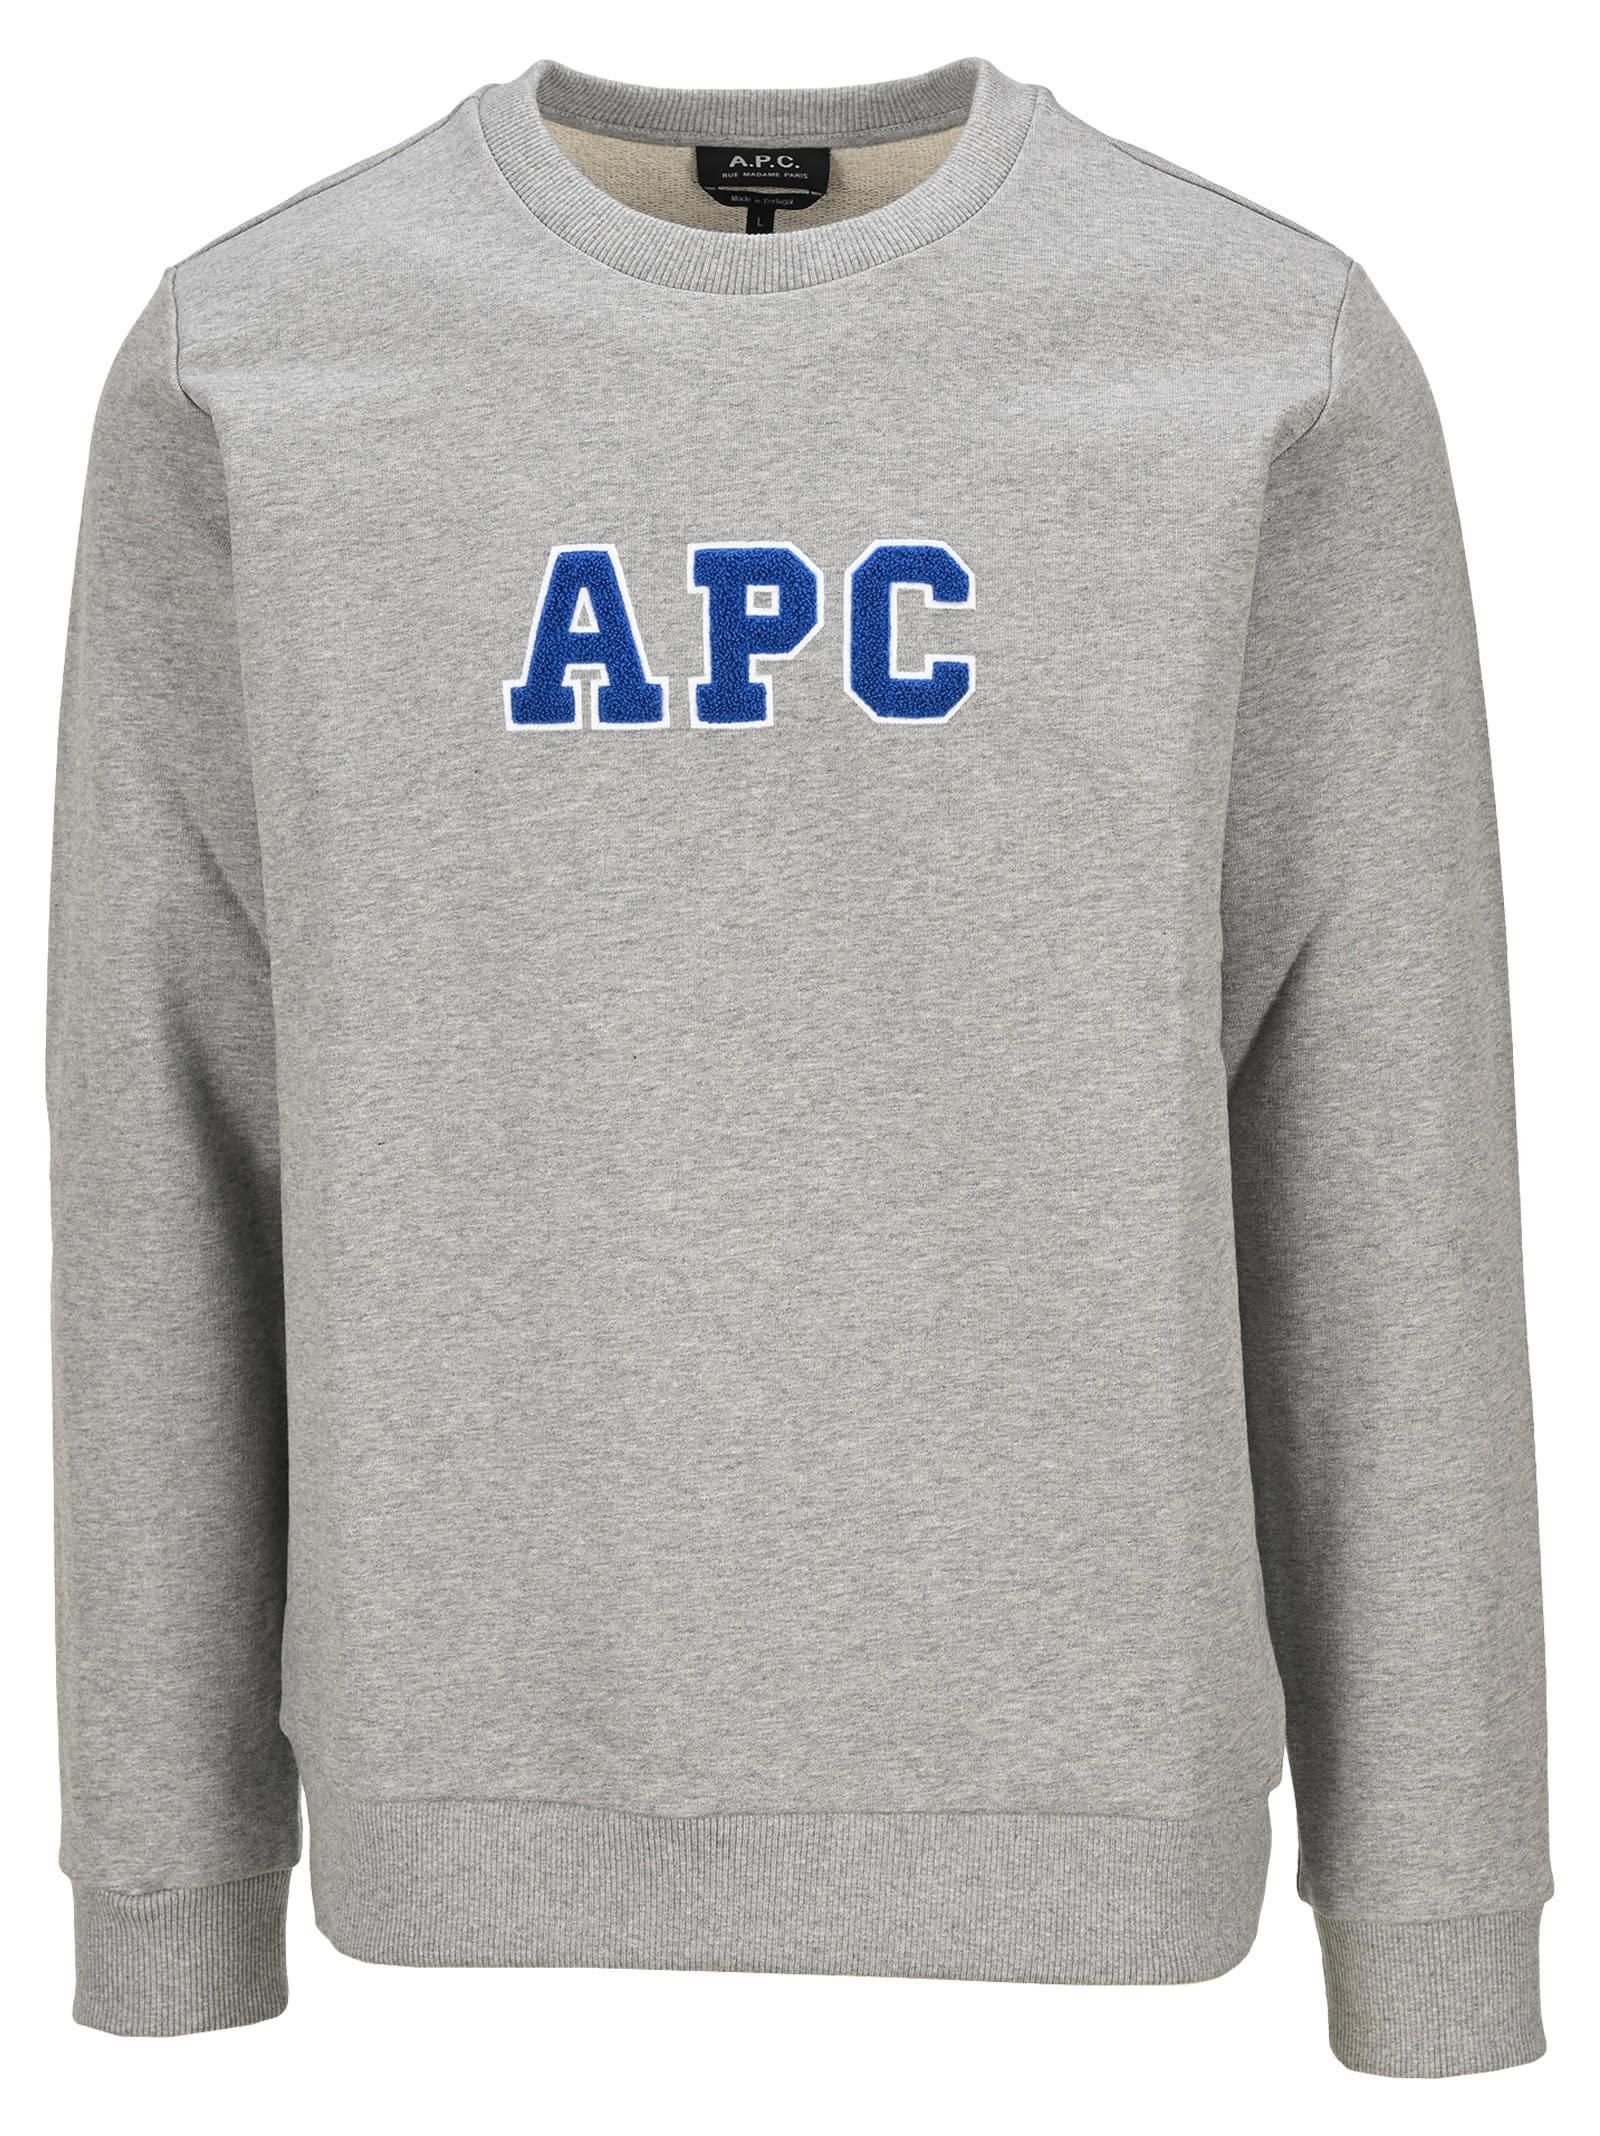 A.P.C. A.P.C. MALCOM SWEATSHIRT